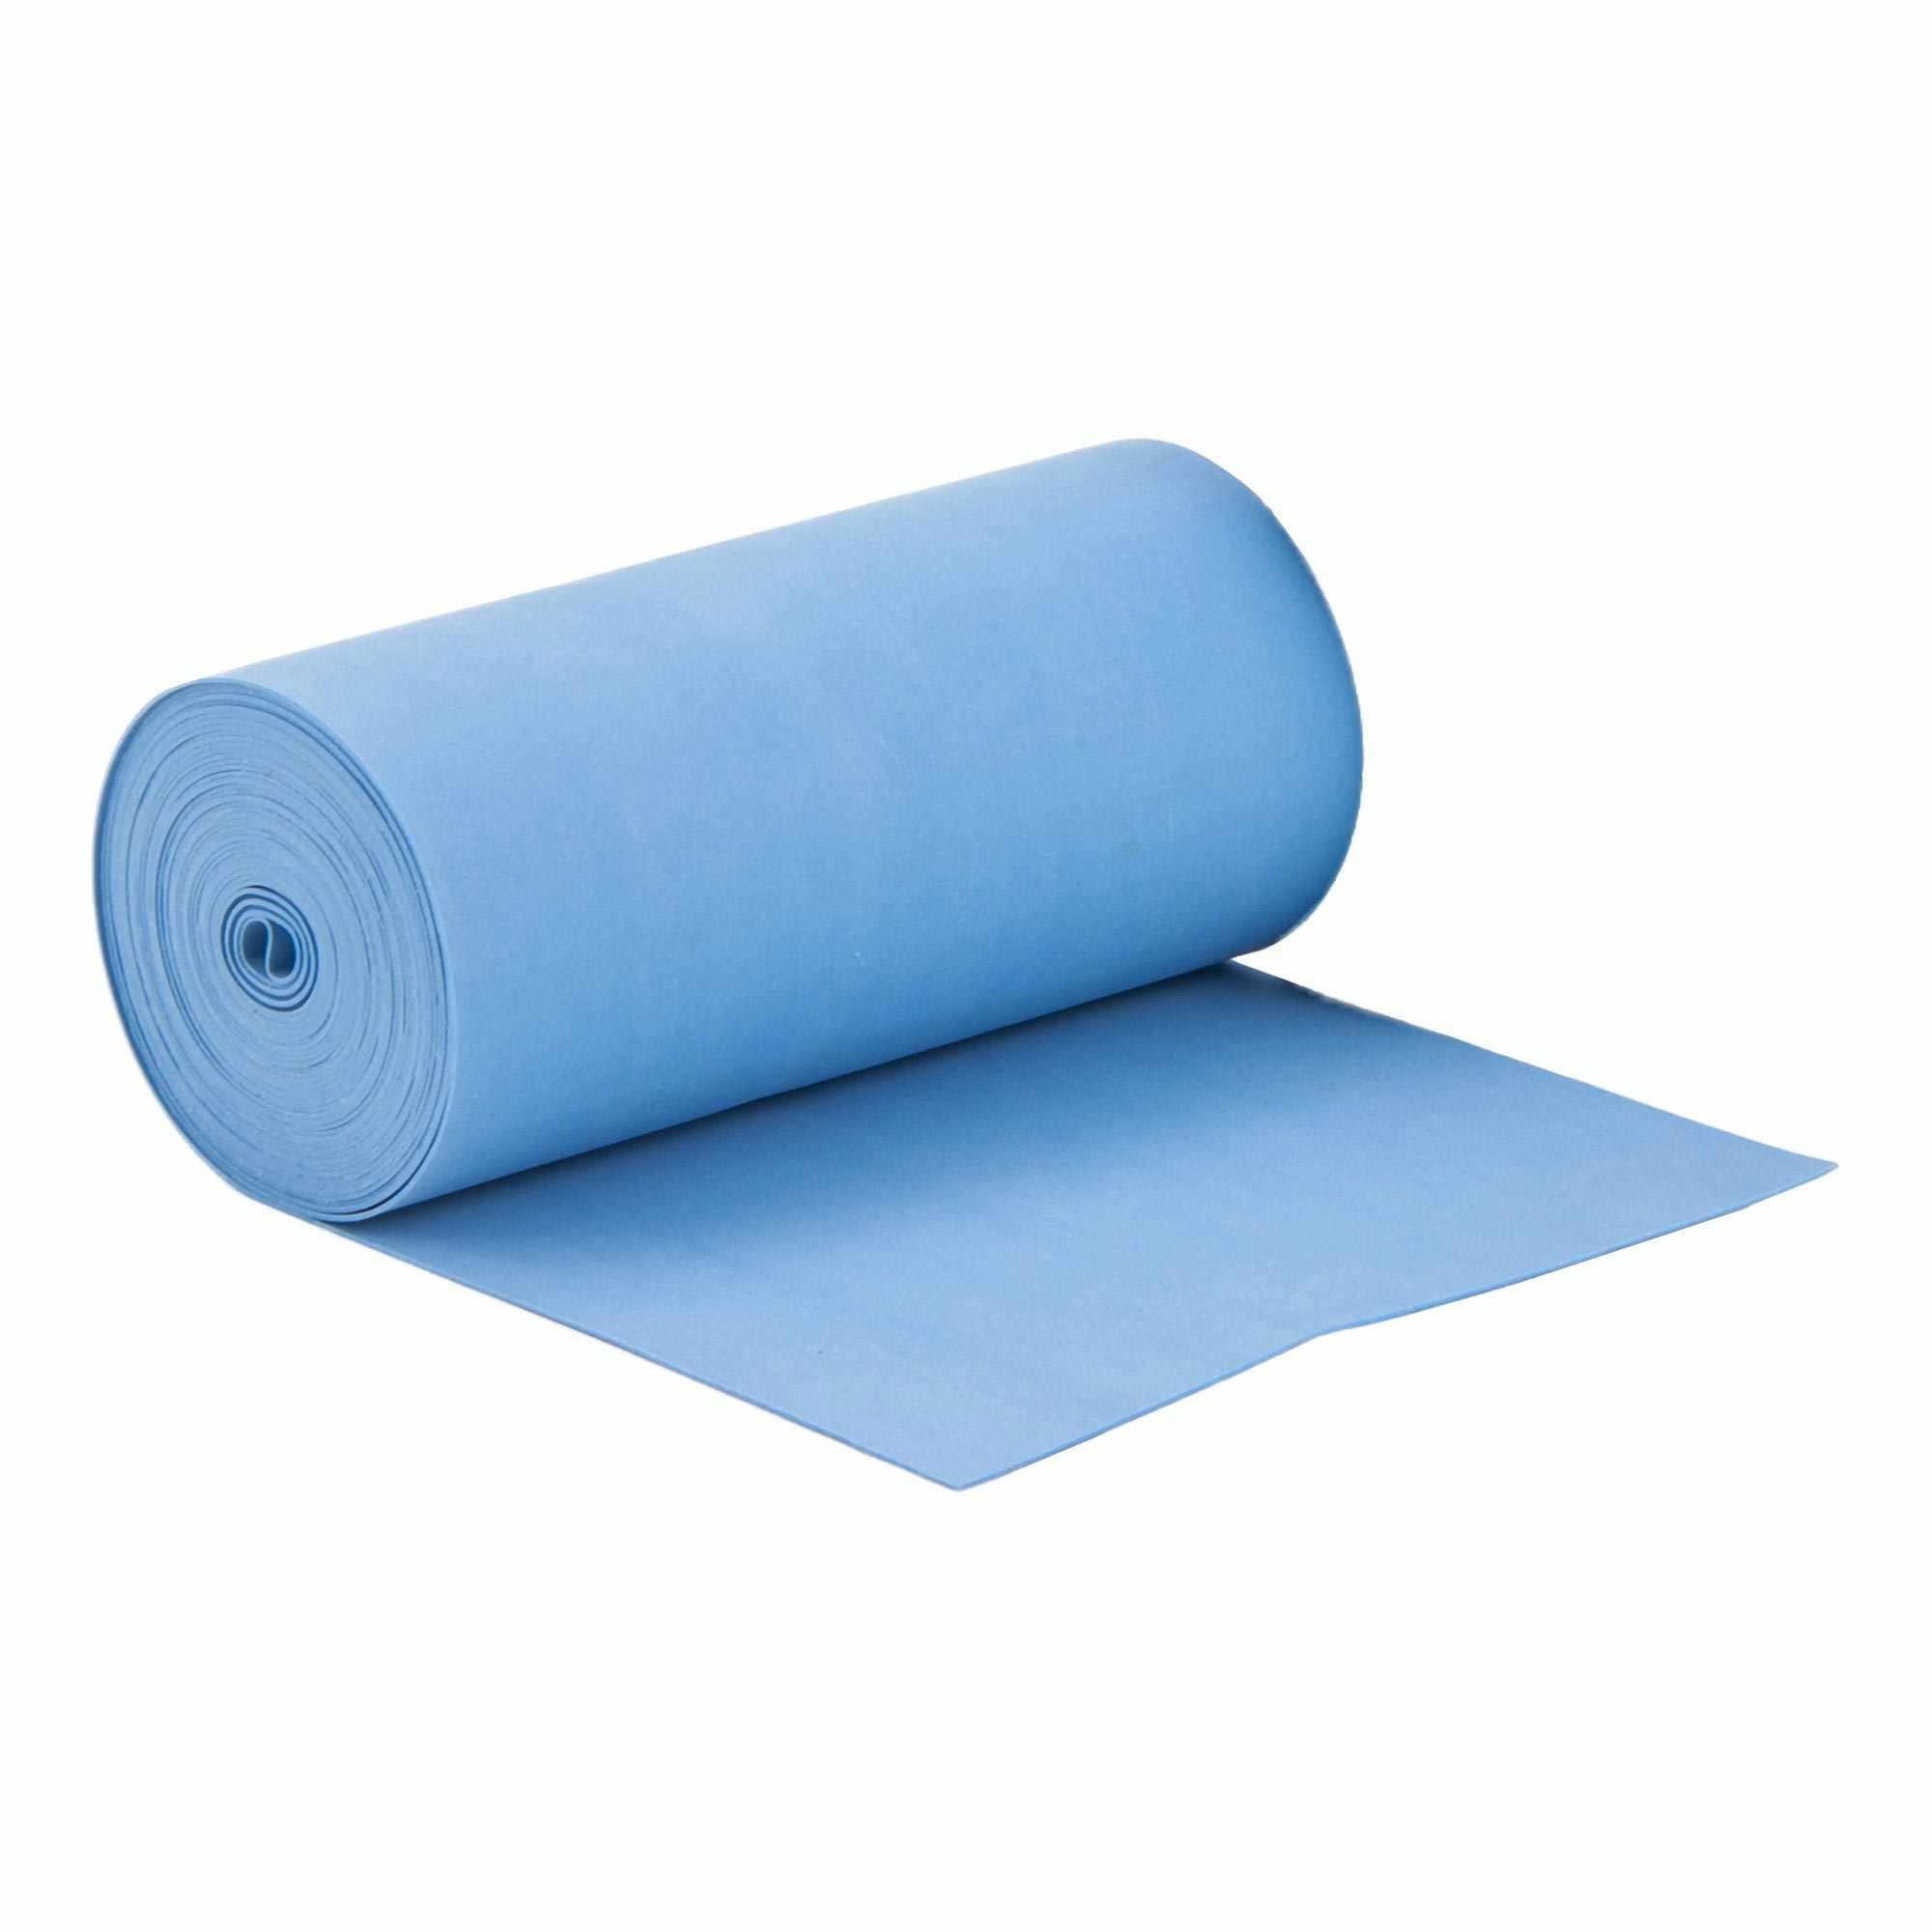 "Esmark Compression Bandage Sterile, Latex-Free, 3"" x 9 ft"